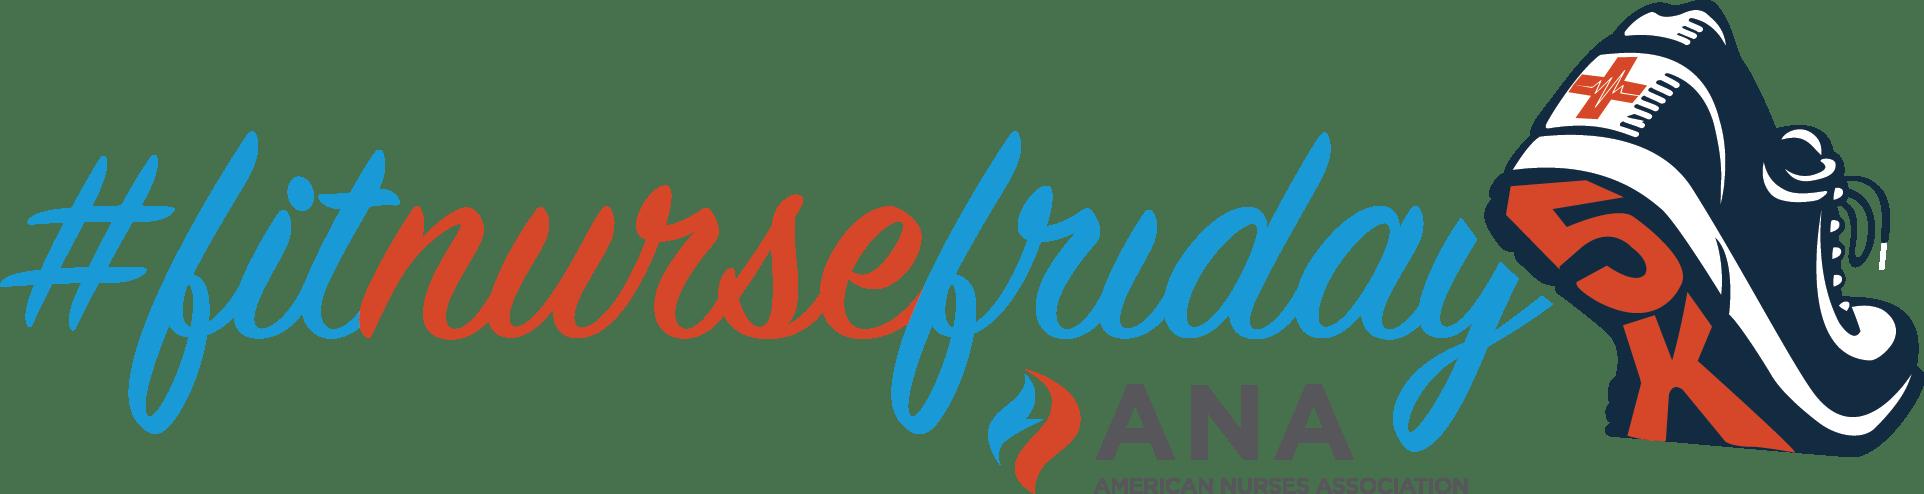 fit nurse friday ANA logo